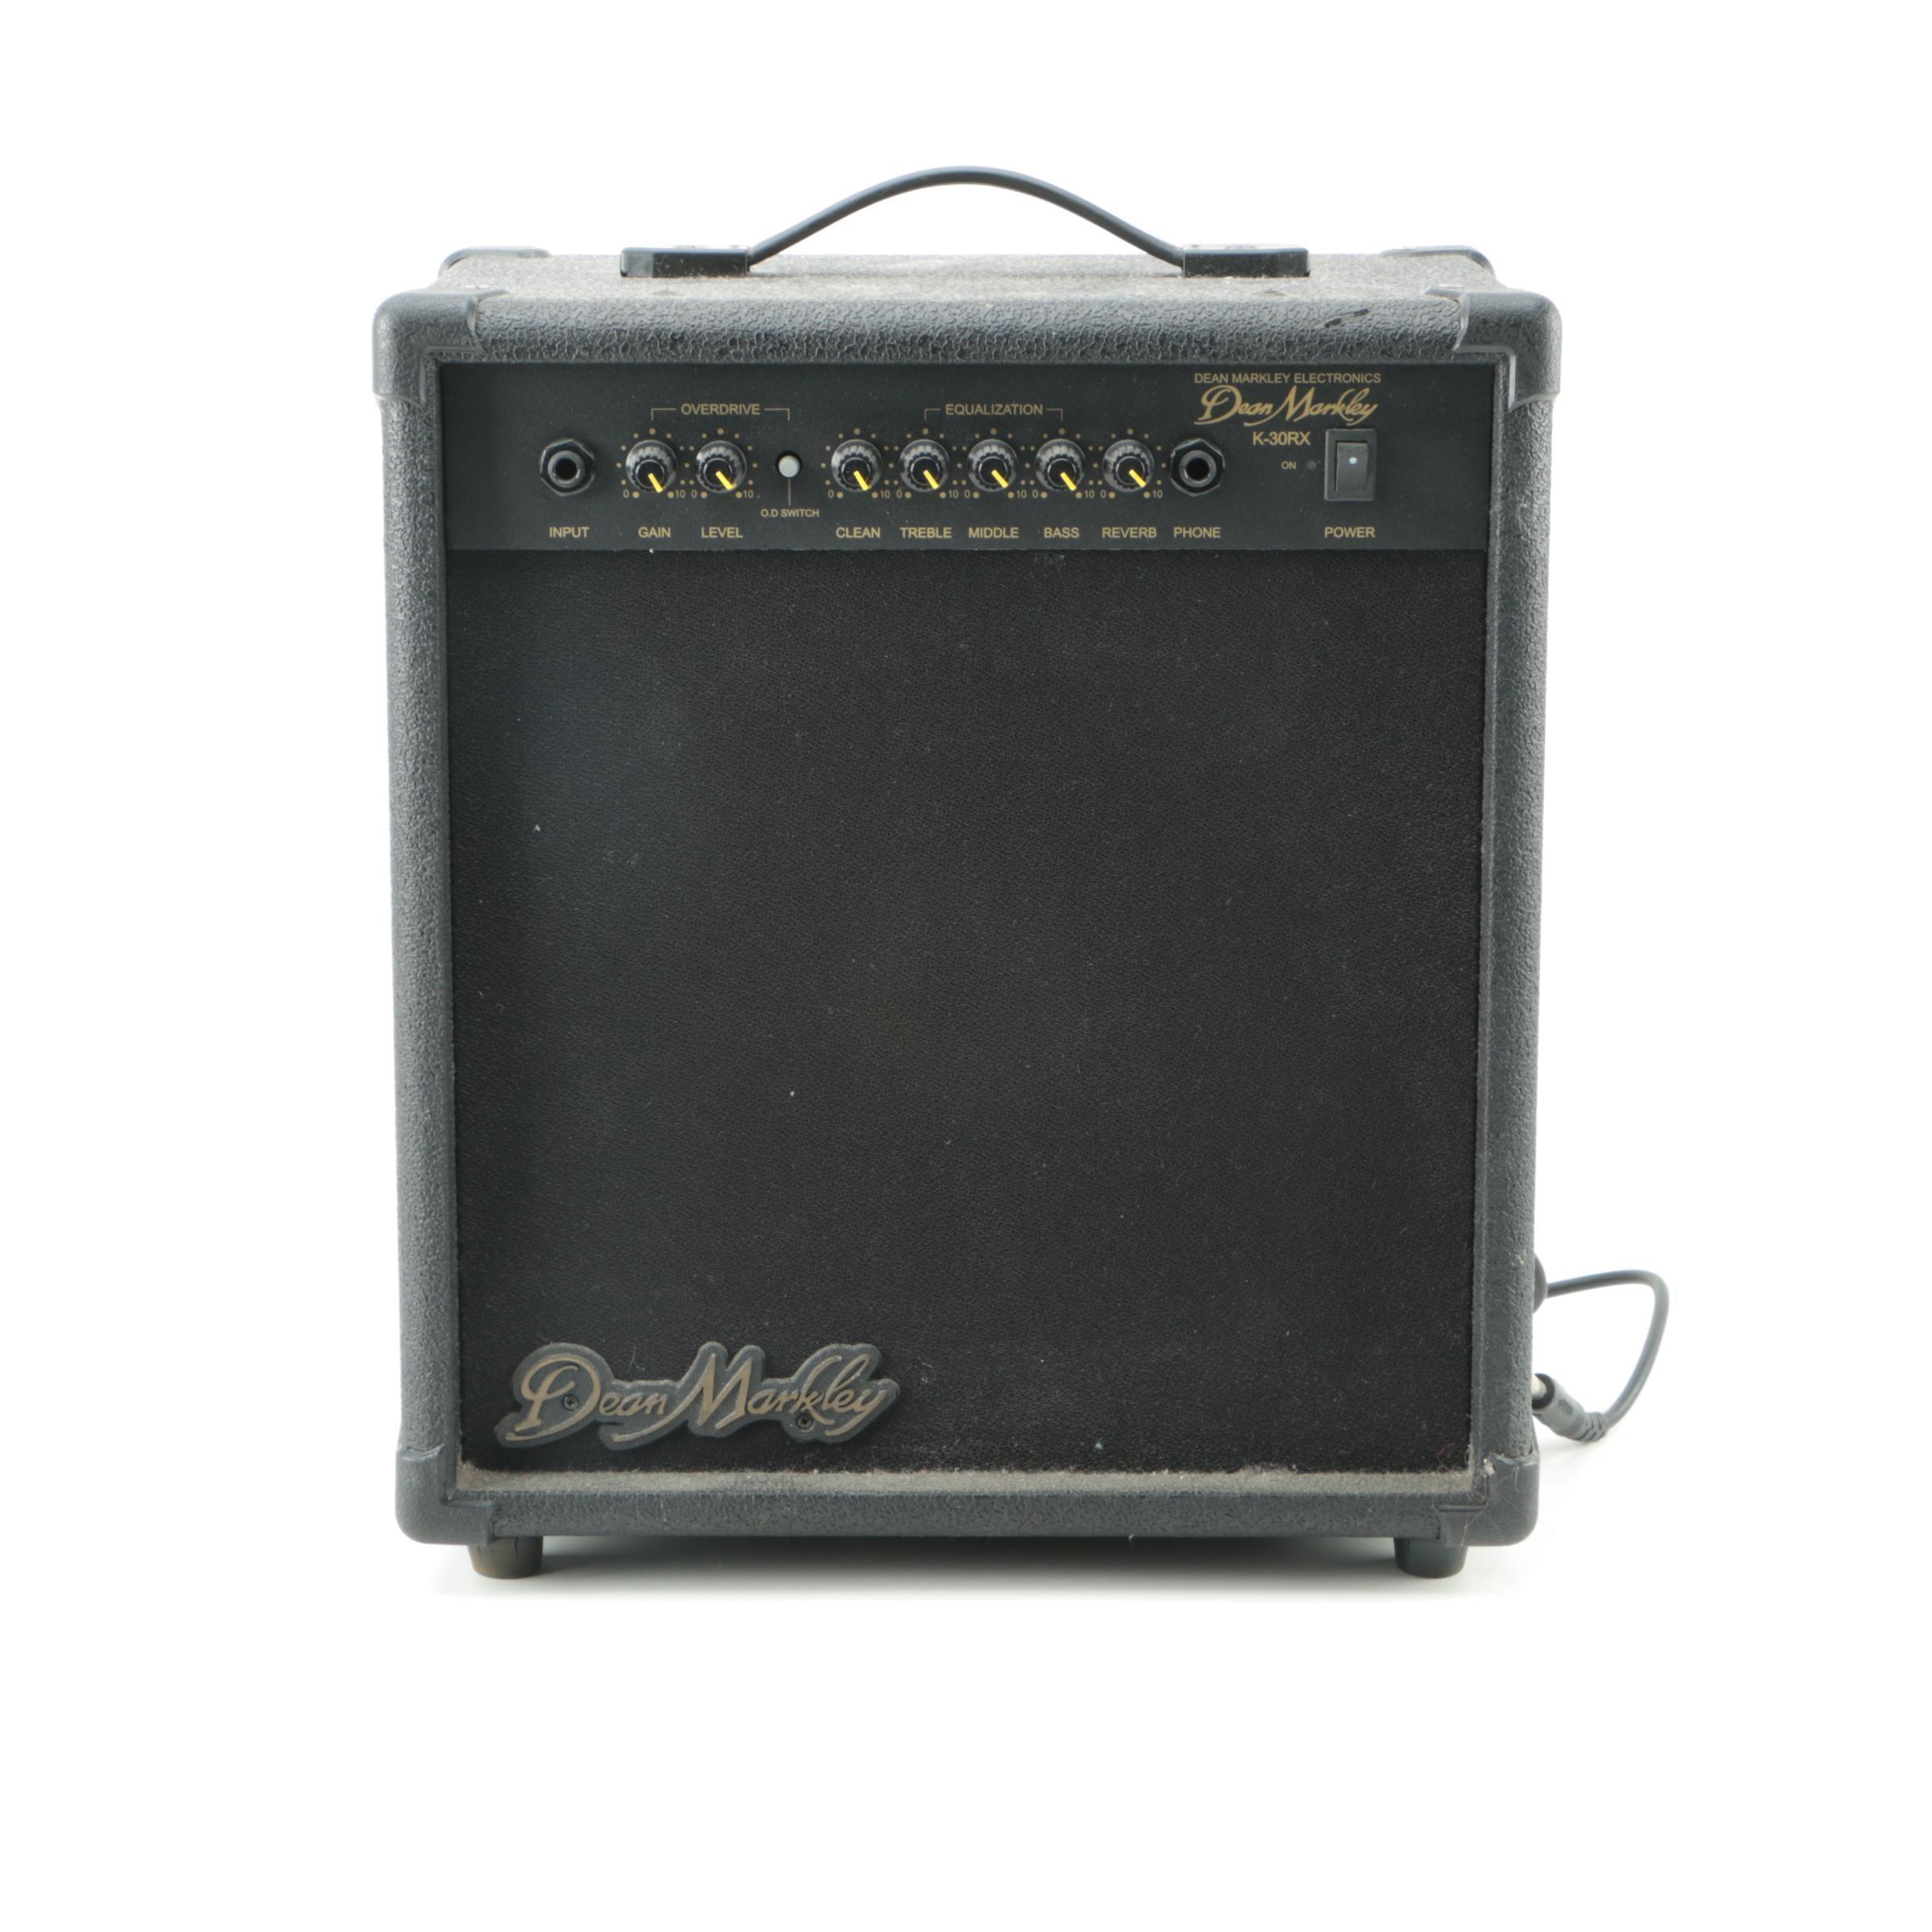 Dean Markley K-30RX Guitar Amp